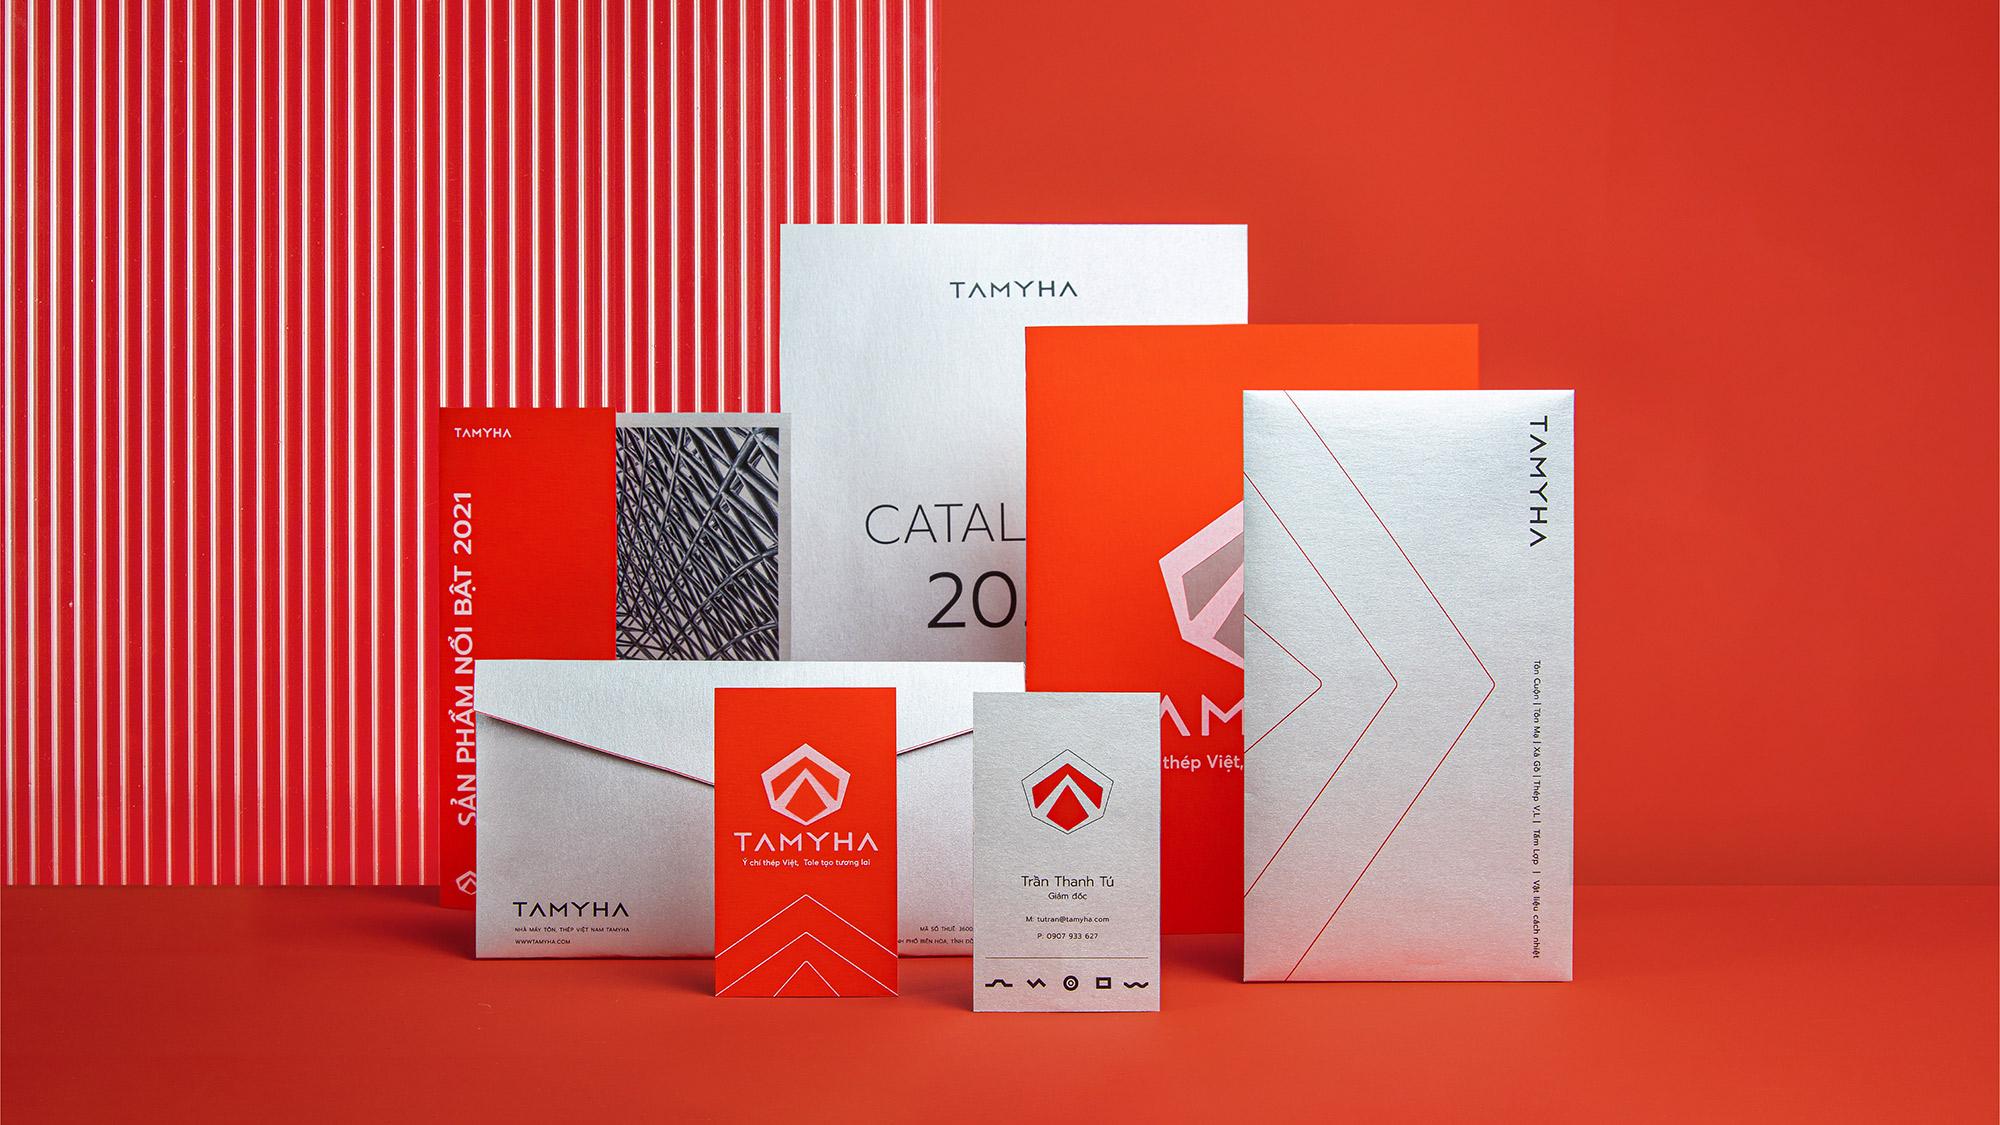 Vũ Digital Create Rebranding for Tamyha a Steel Sheet Manufacturer